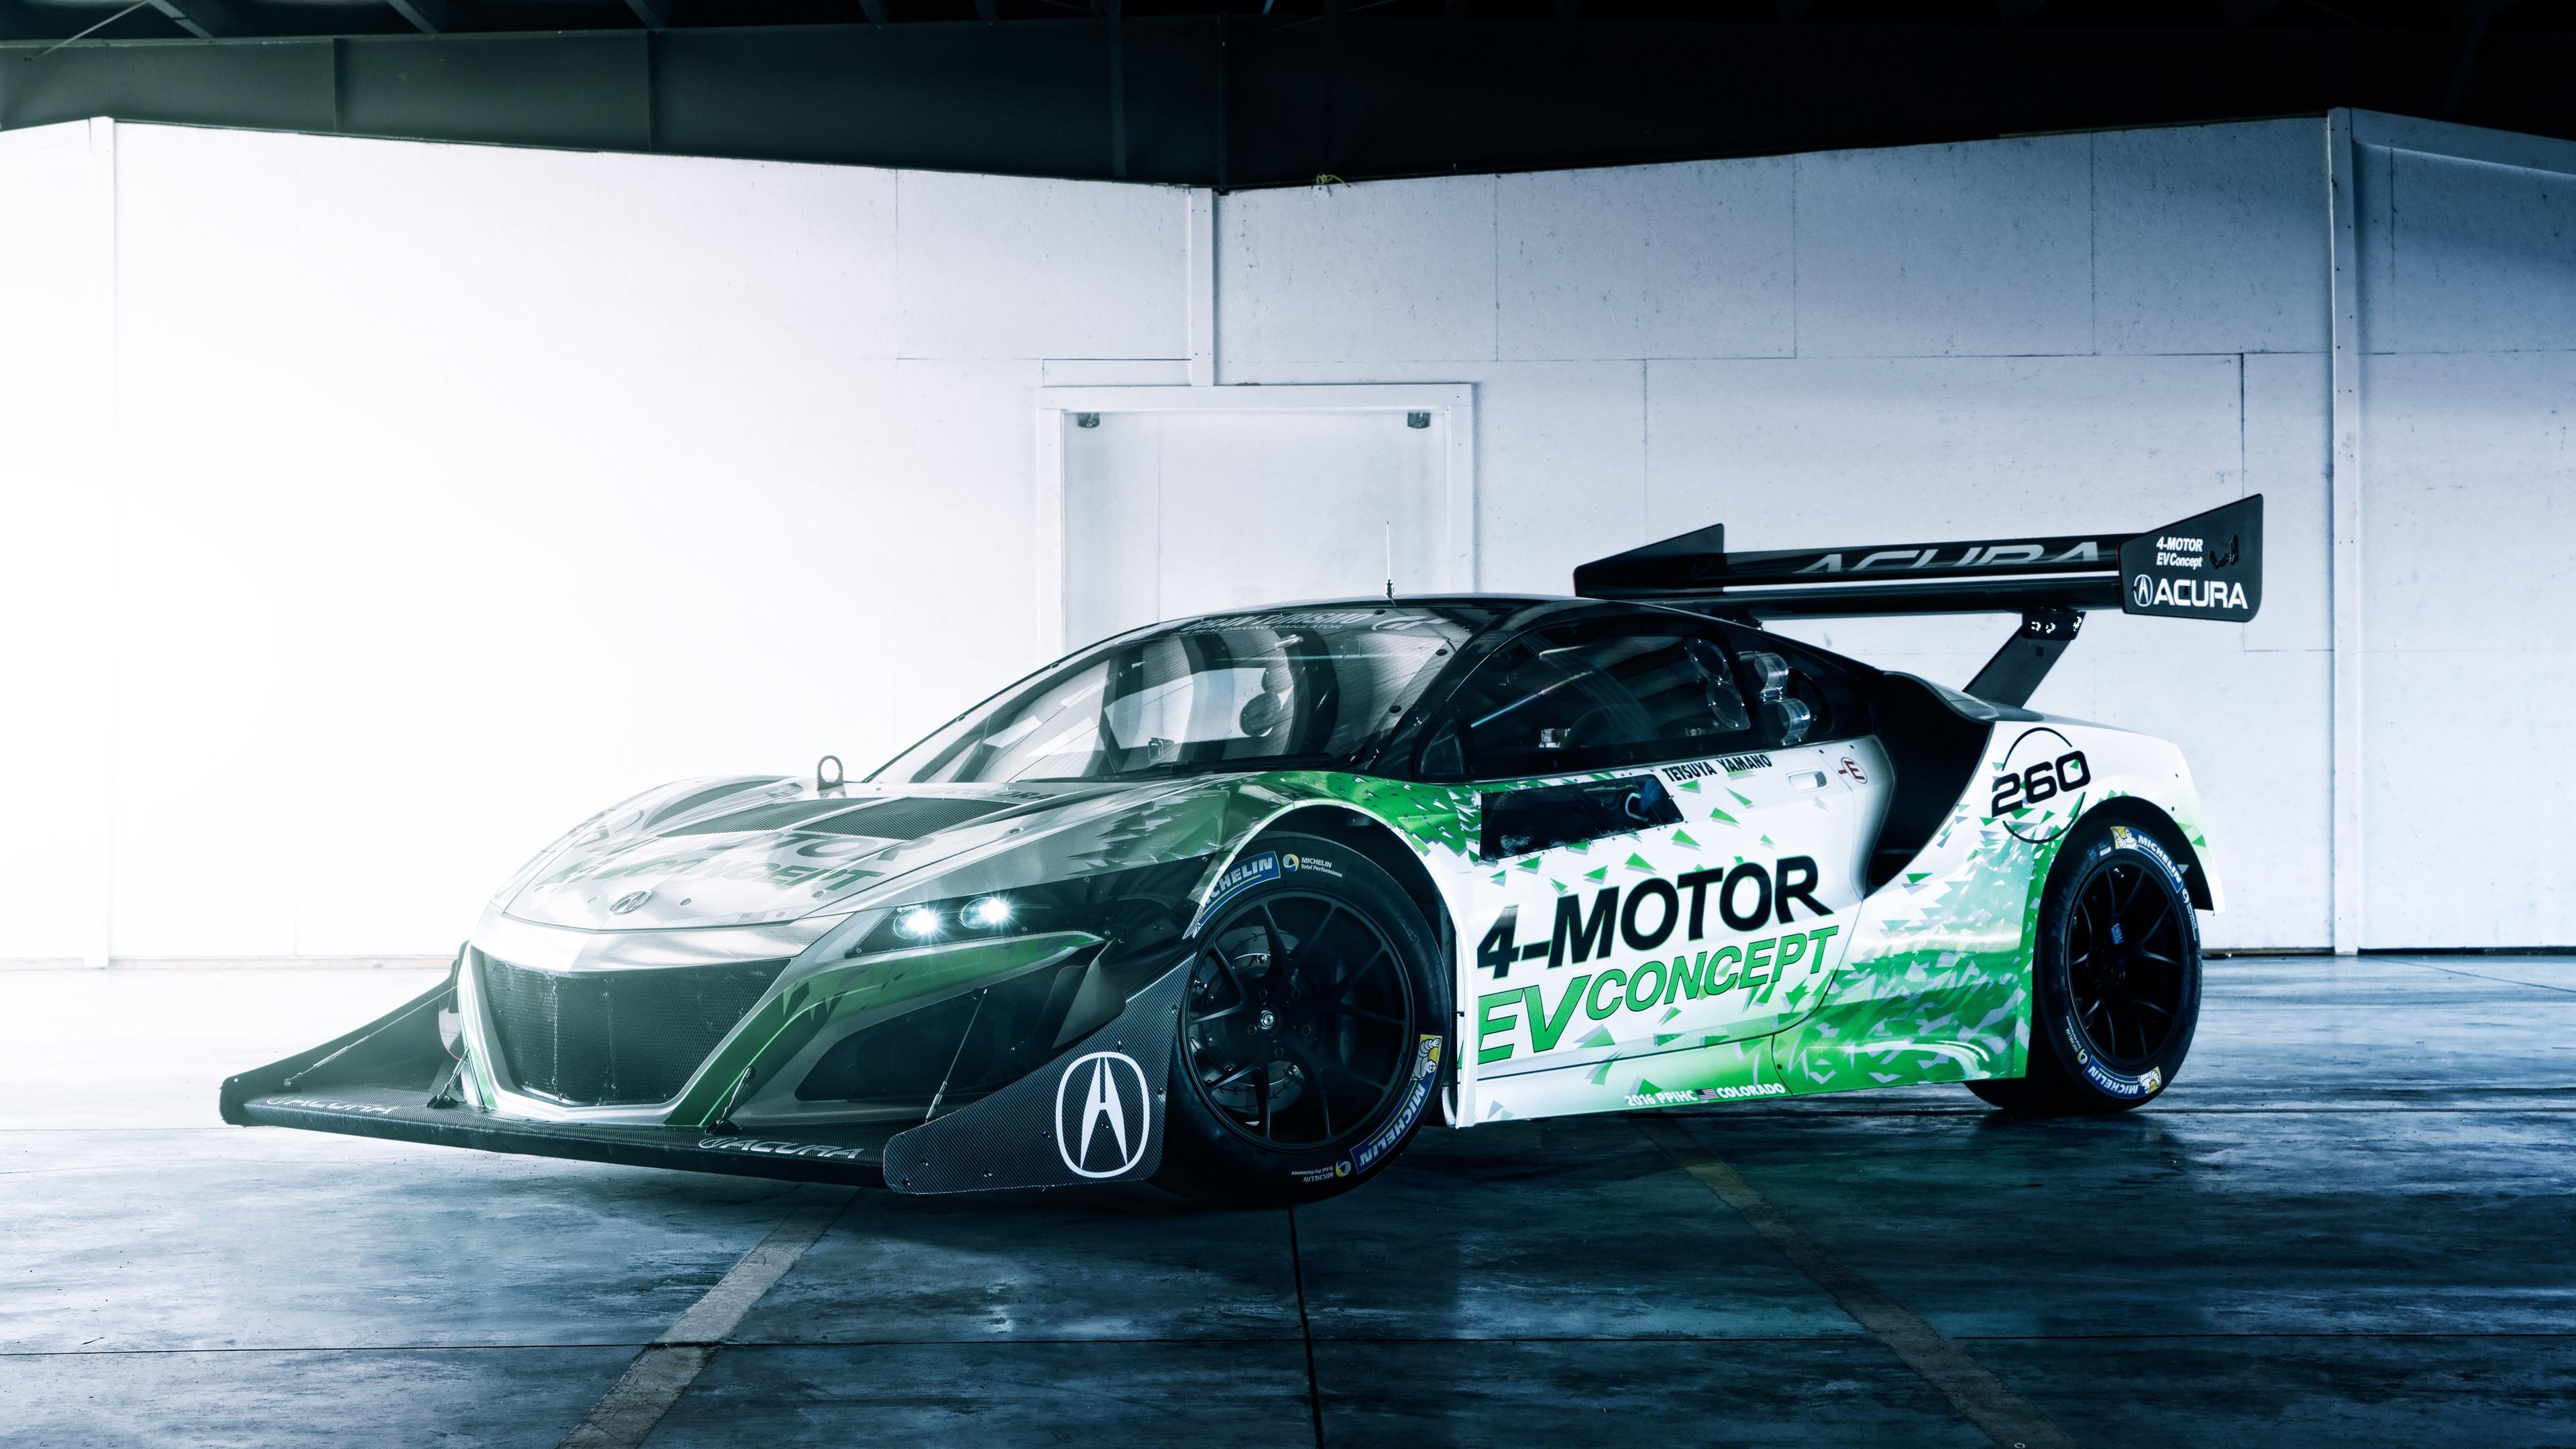 2017 acura nsx ev concept 1539104787 - 2017 Acura Nsx Ev Concept - concept cars wallpapers, cars wallpapers, acura nsx wallpapers, 2017 cars wallpapers